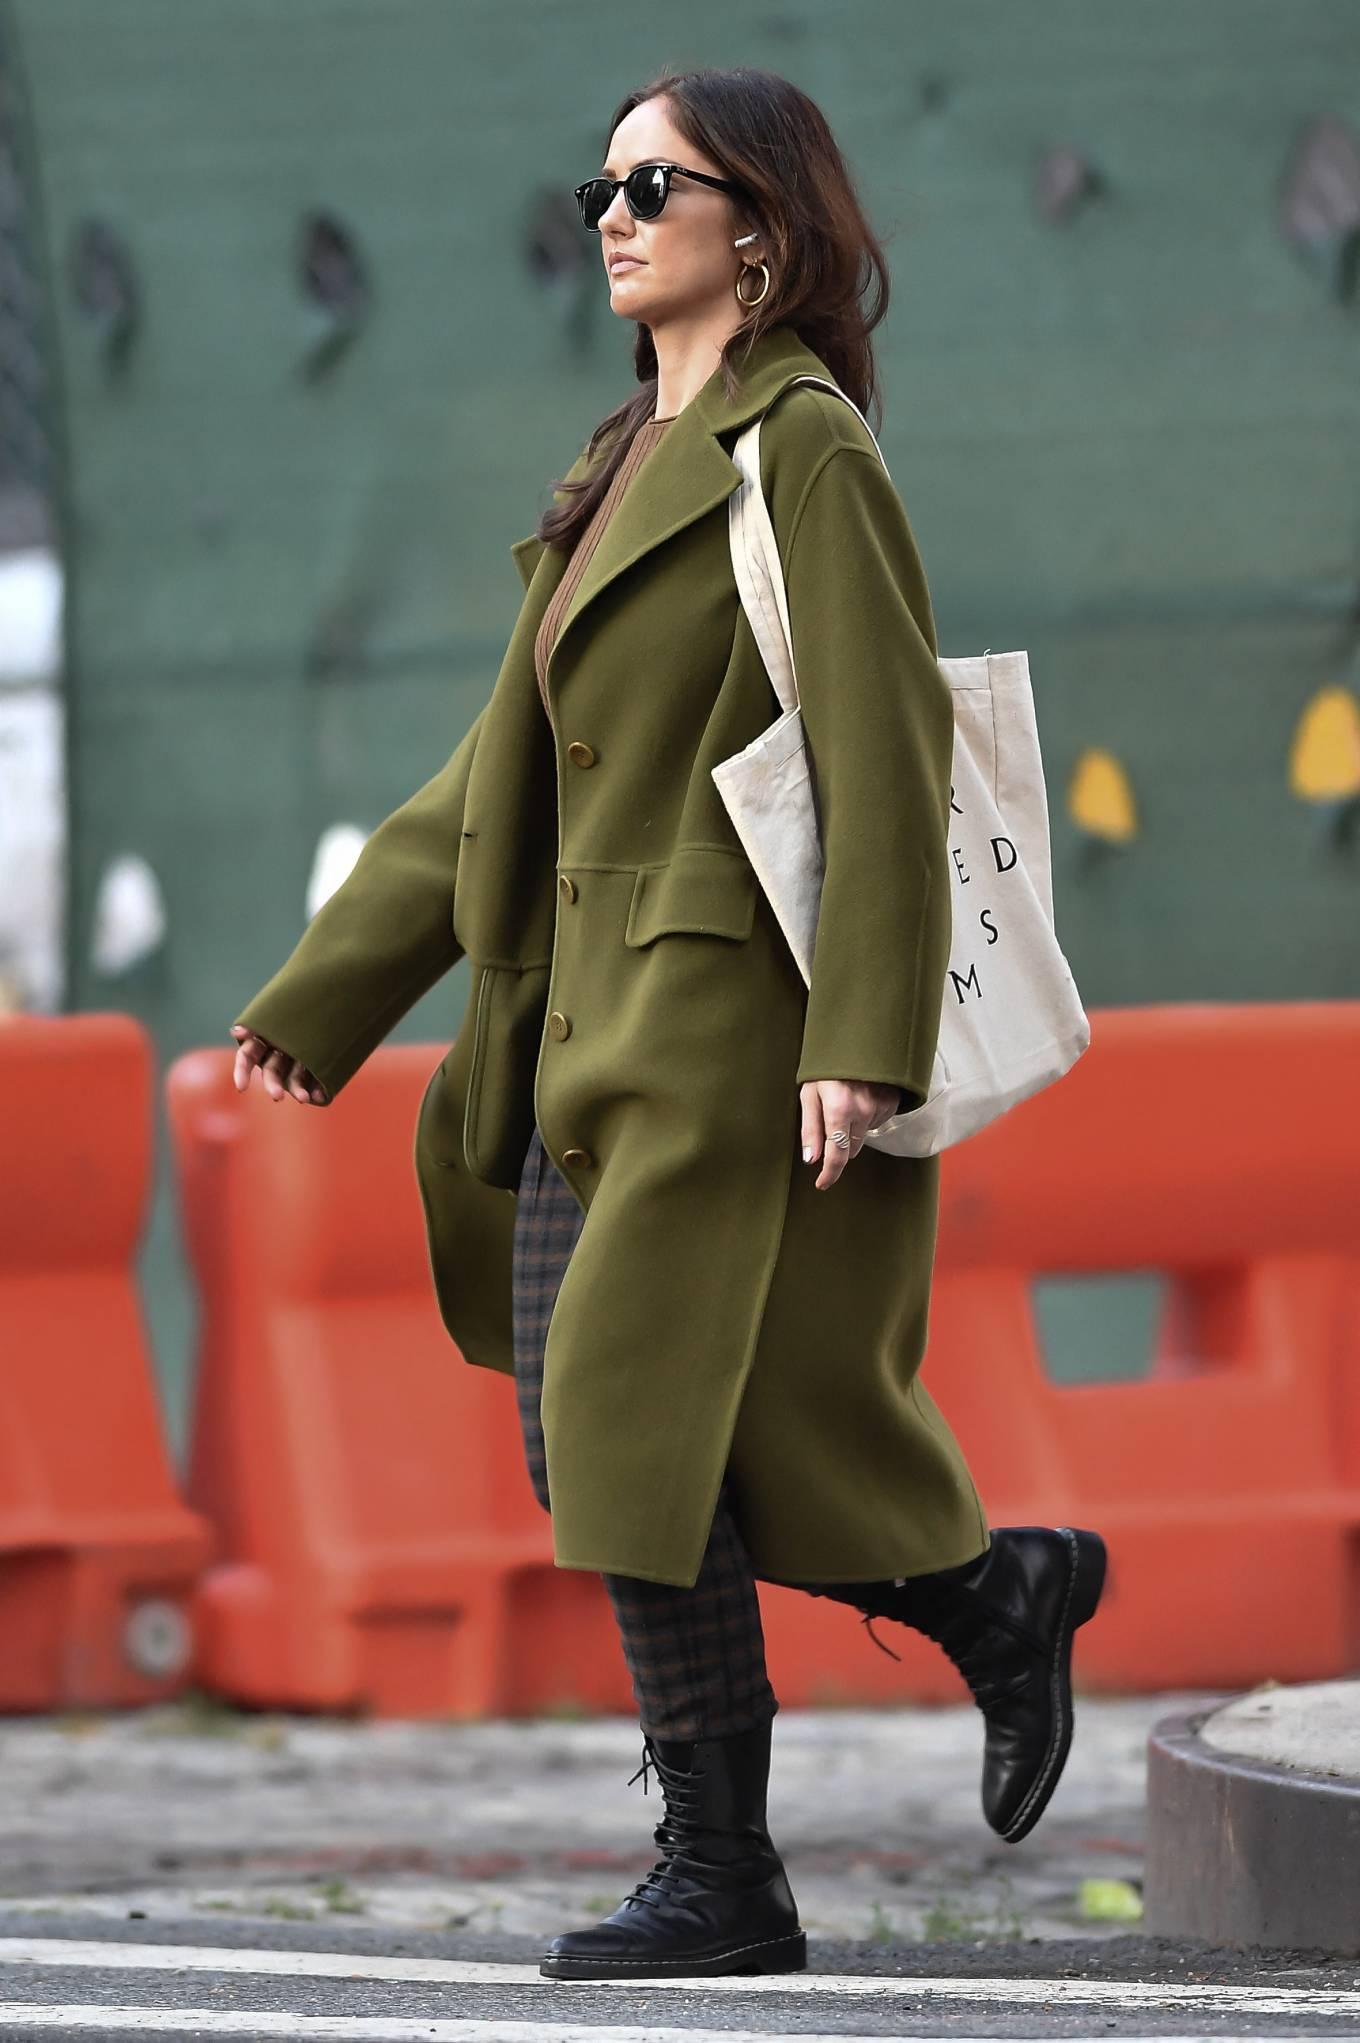 Minka Kelly 2021 : Minka Kelly – In olive green runs errands in New York-11